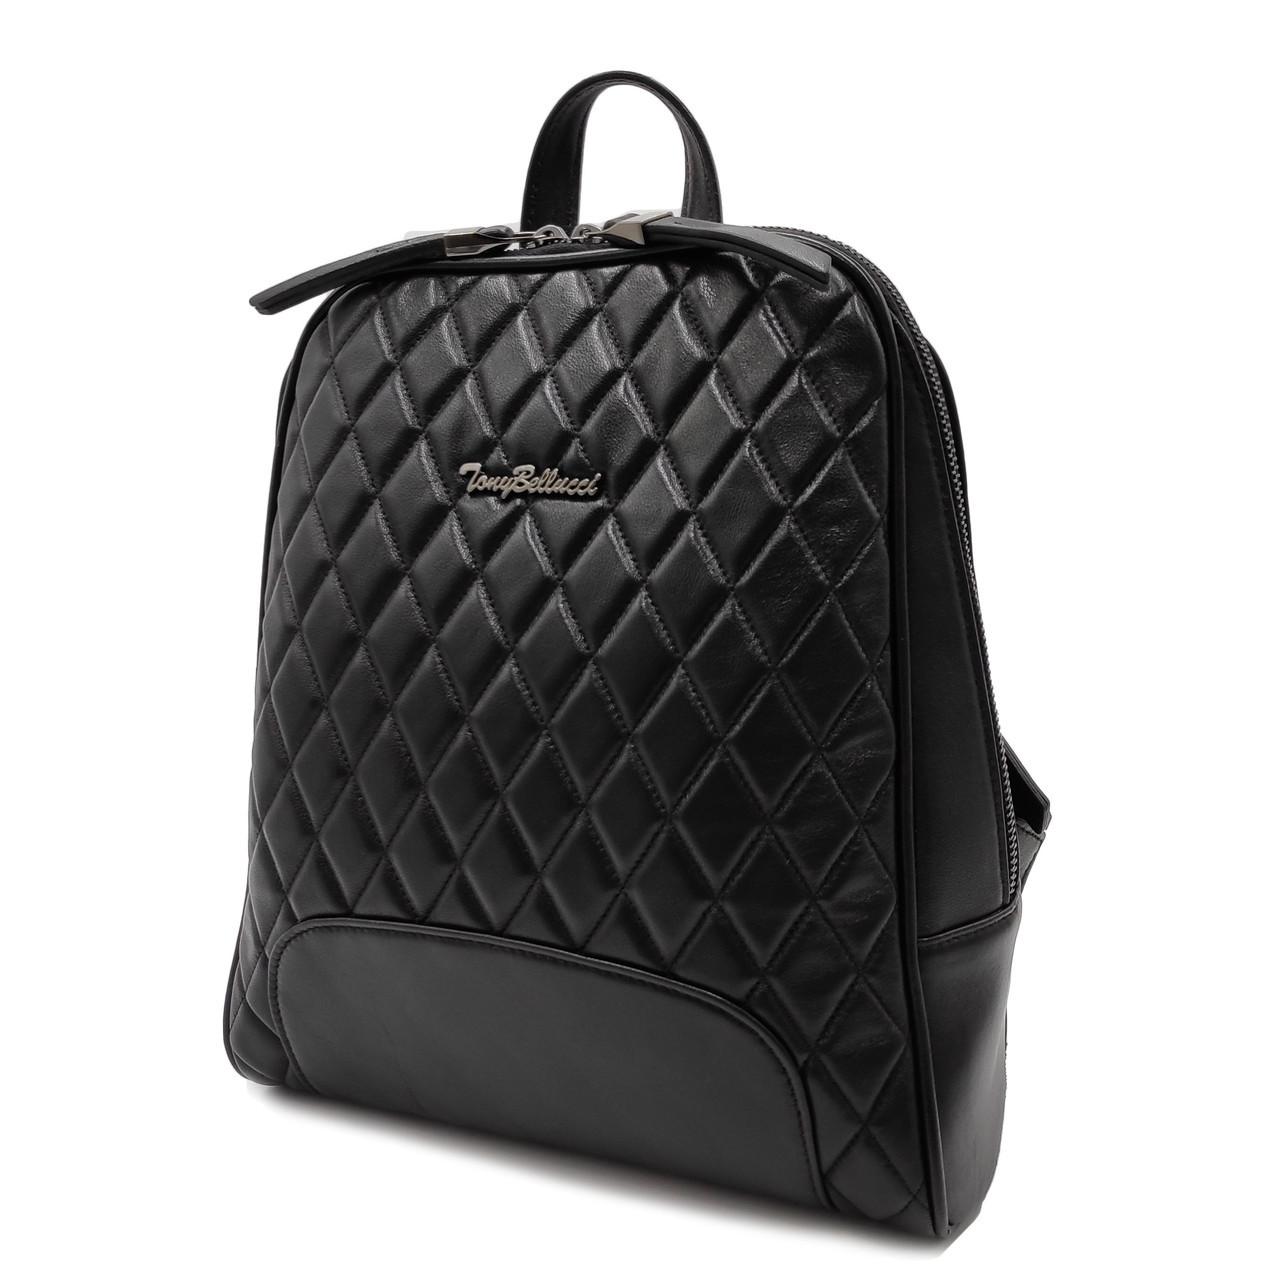 Рюкзак кожа натуральная черная лайка S-0-135 Tony Bellucci